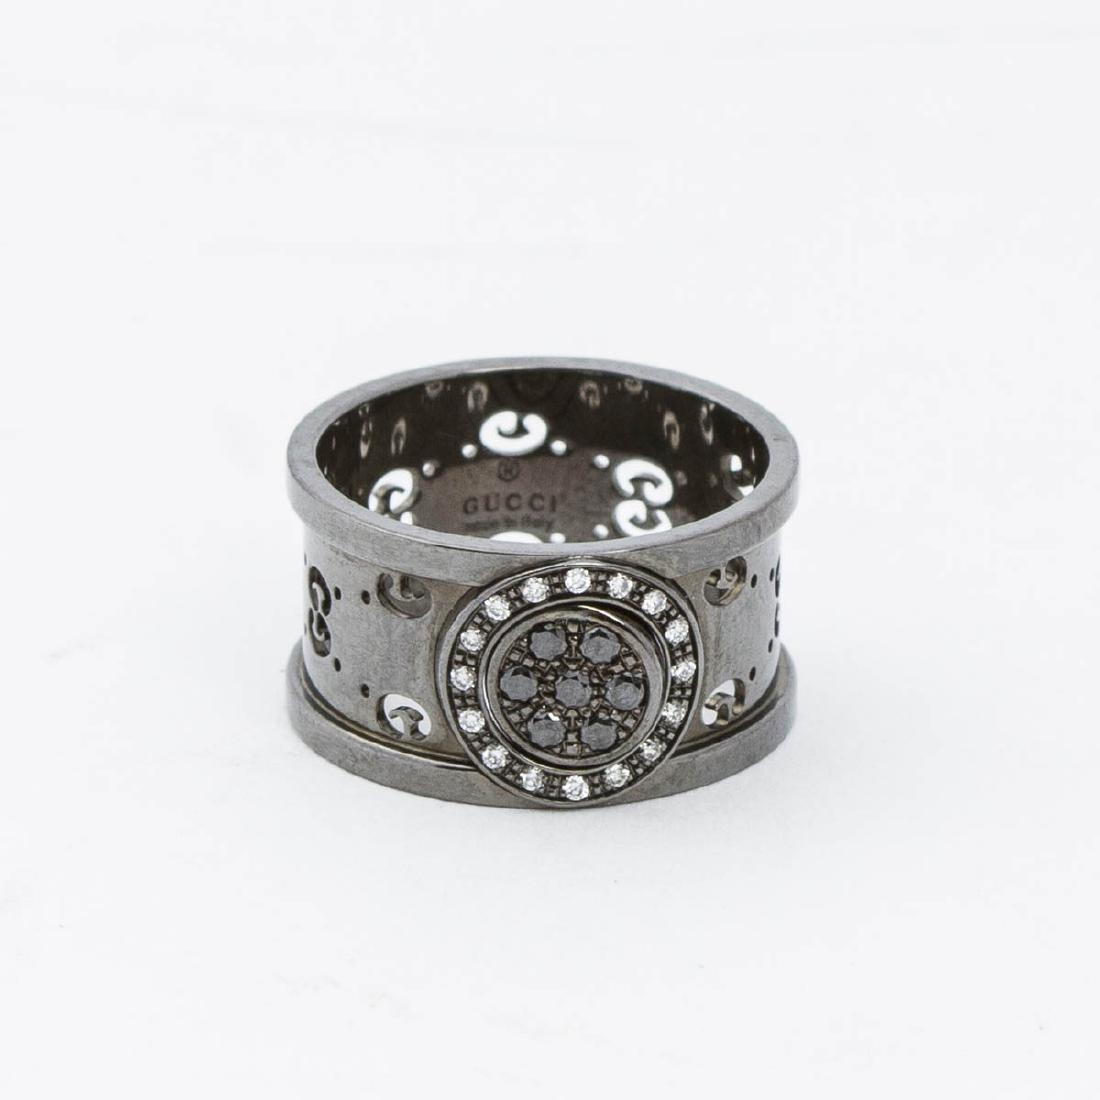 Gucci Icon Ring